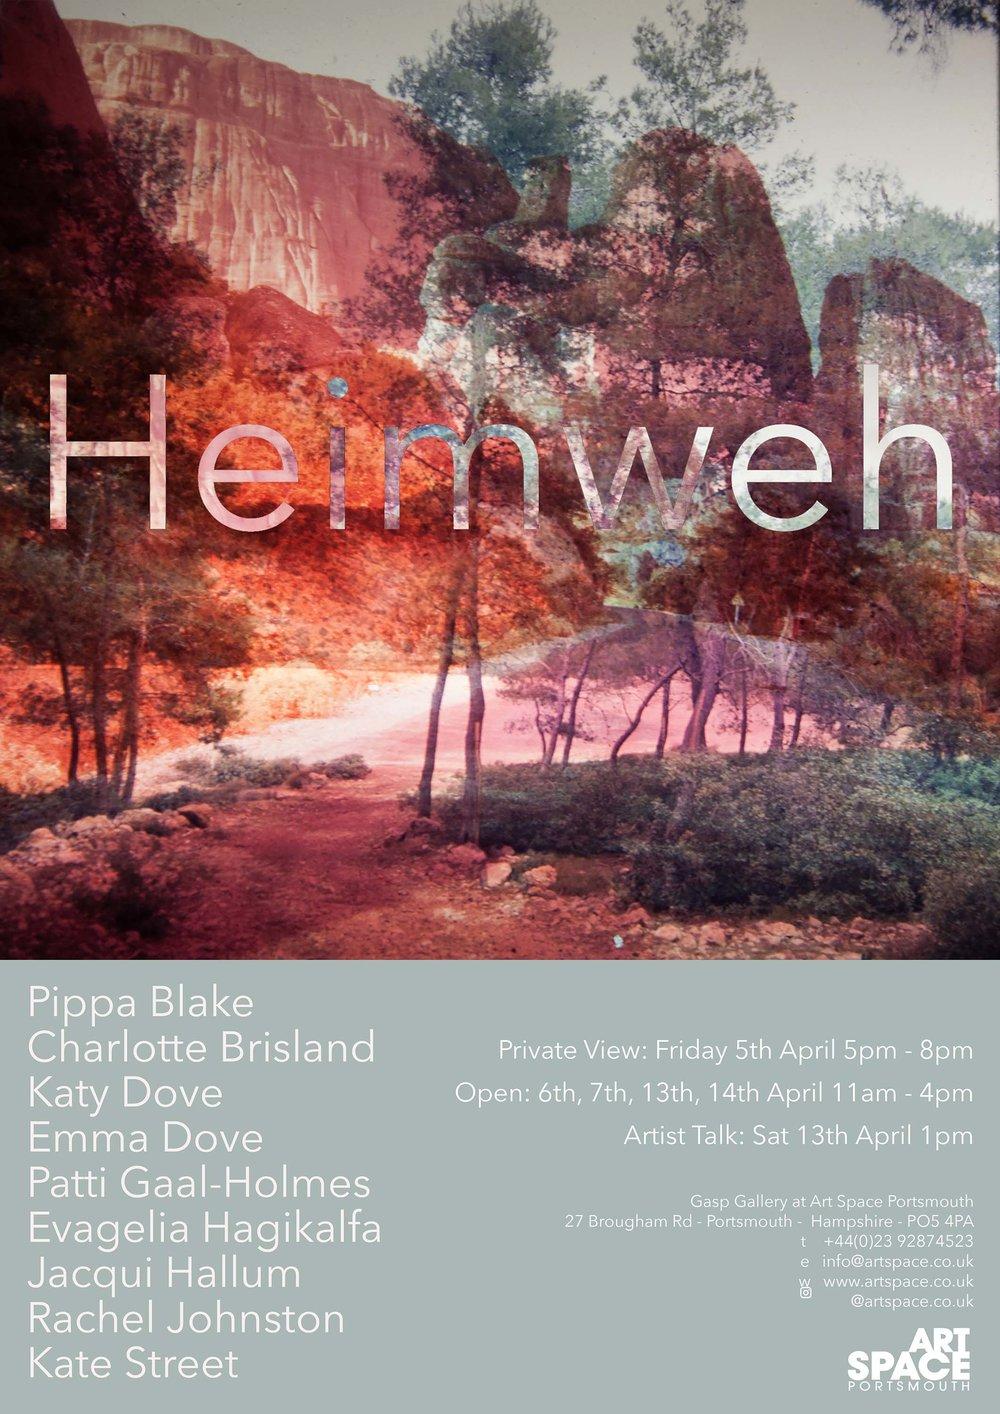 heimweh_poster_low res.jpg